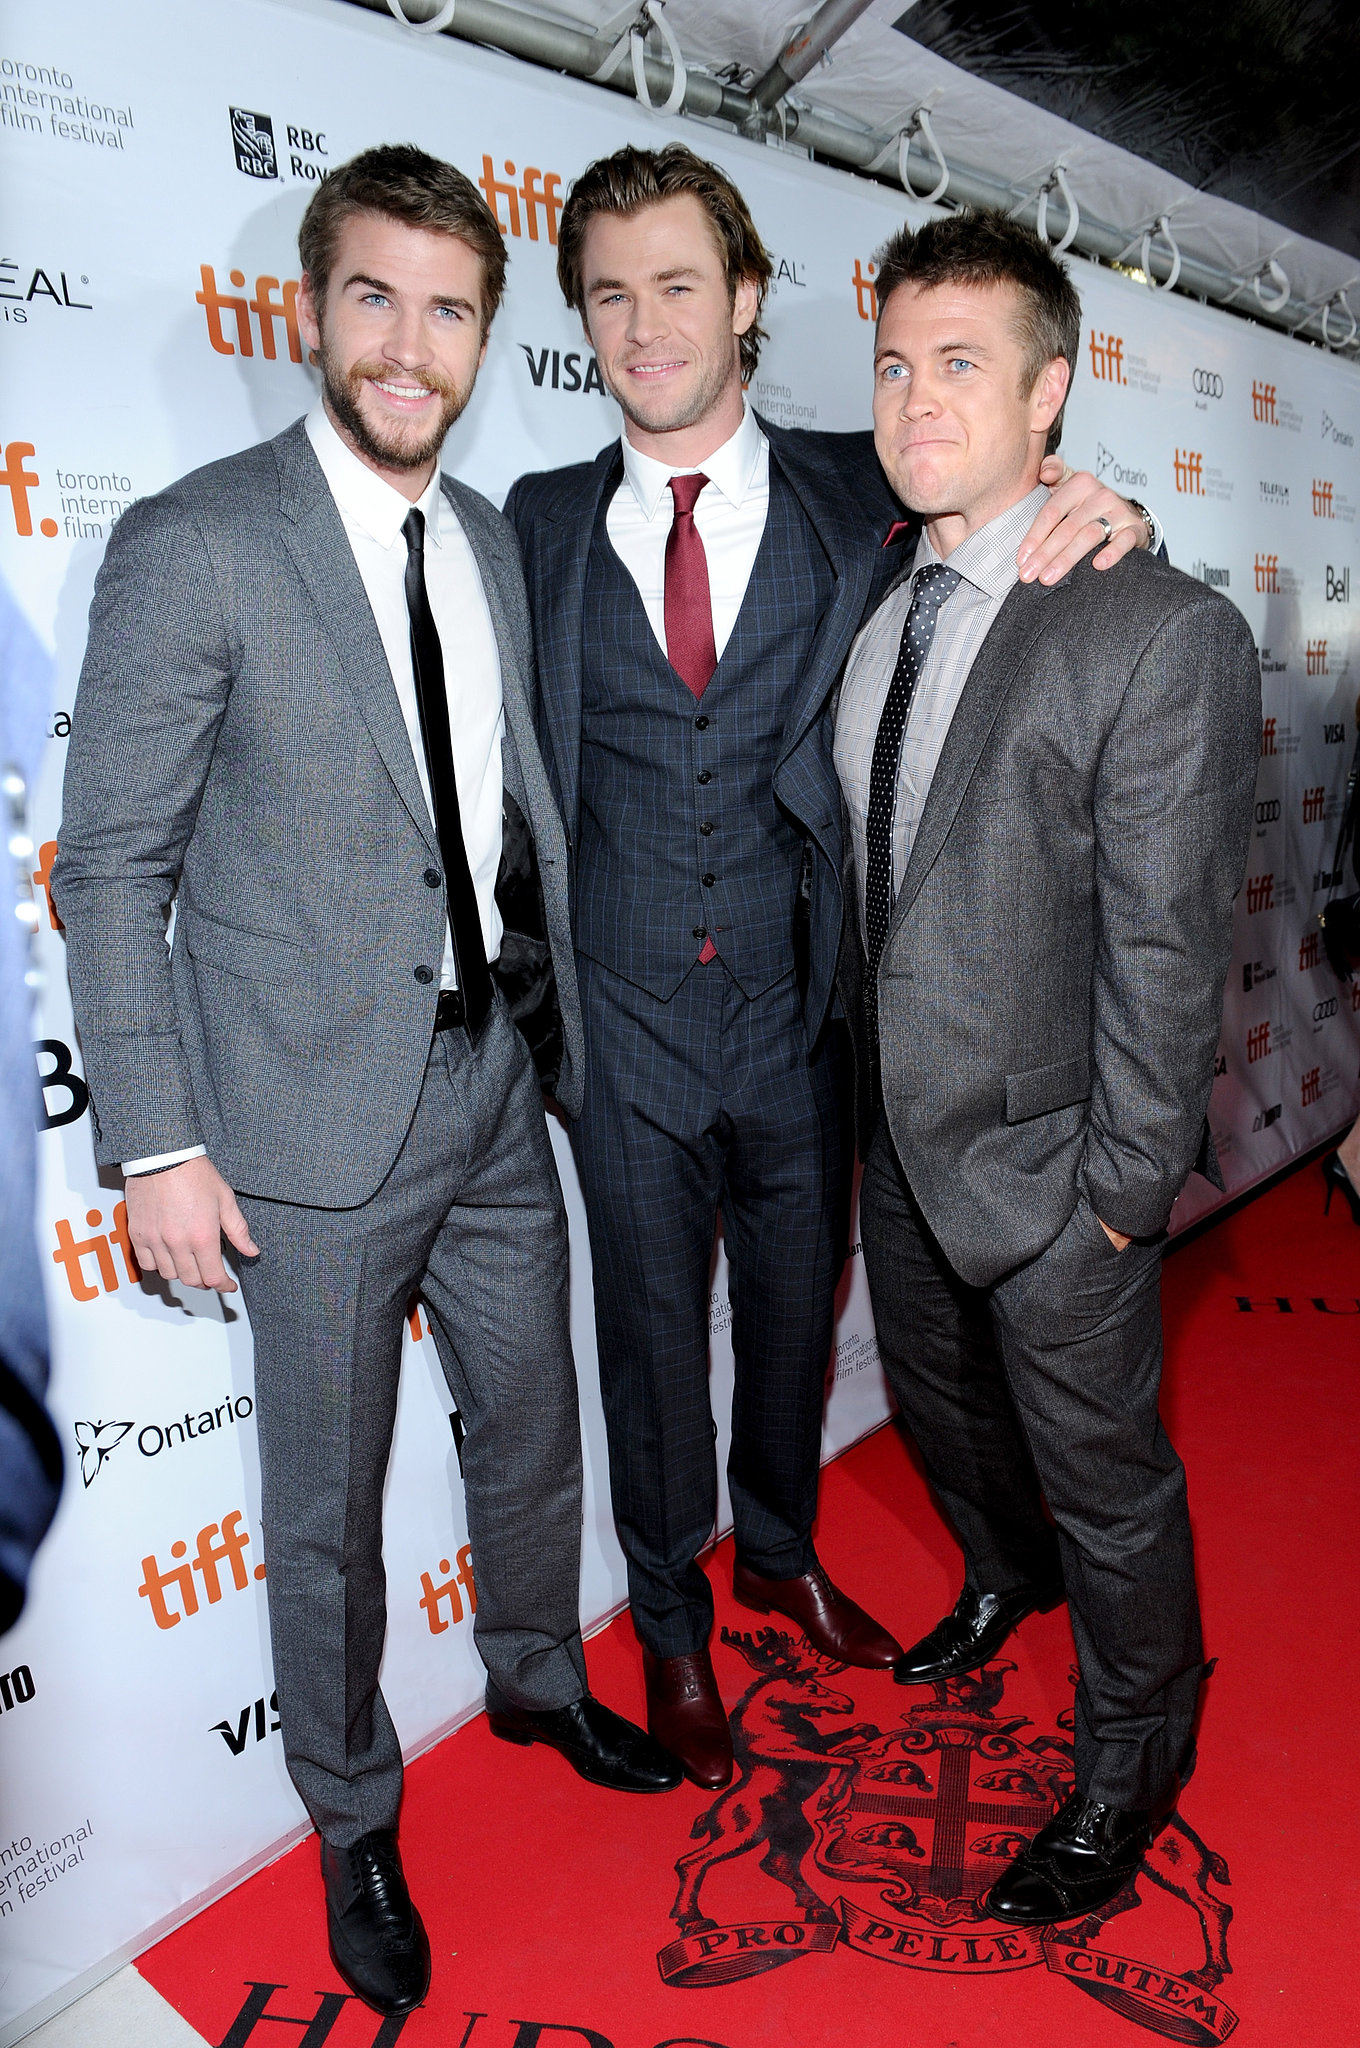 It was a blue-eyed trifecta as Liam Hemsworth, Chris Hemsworth, and Luke Hemsworth strolled the carpet.